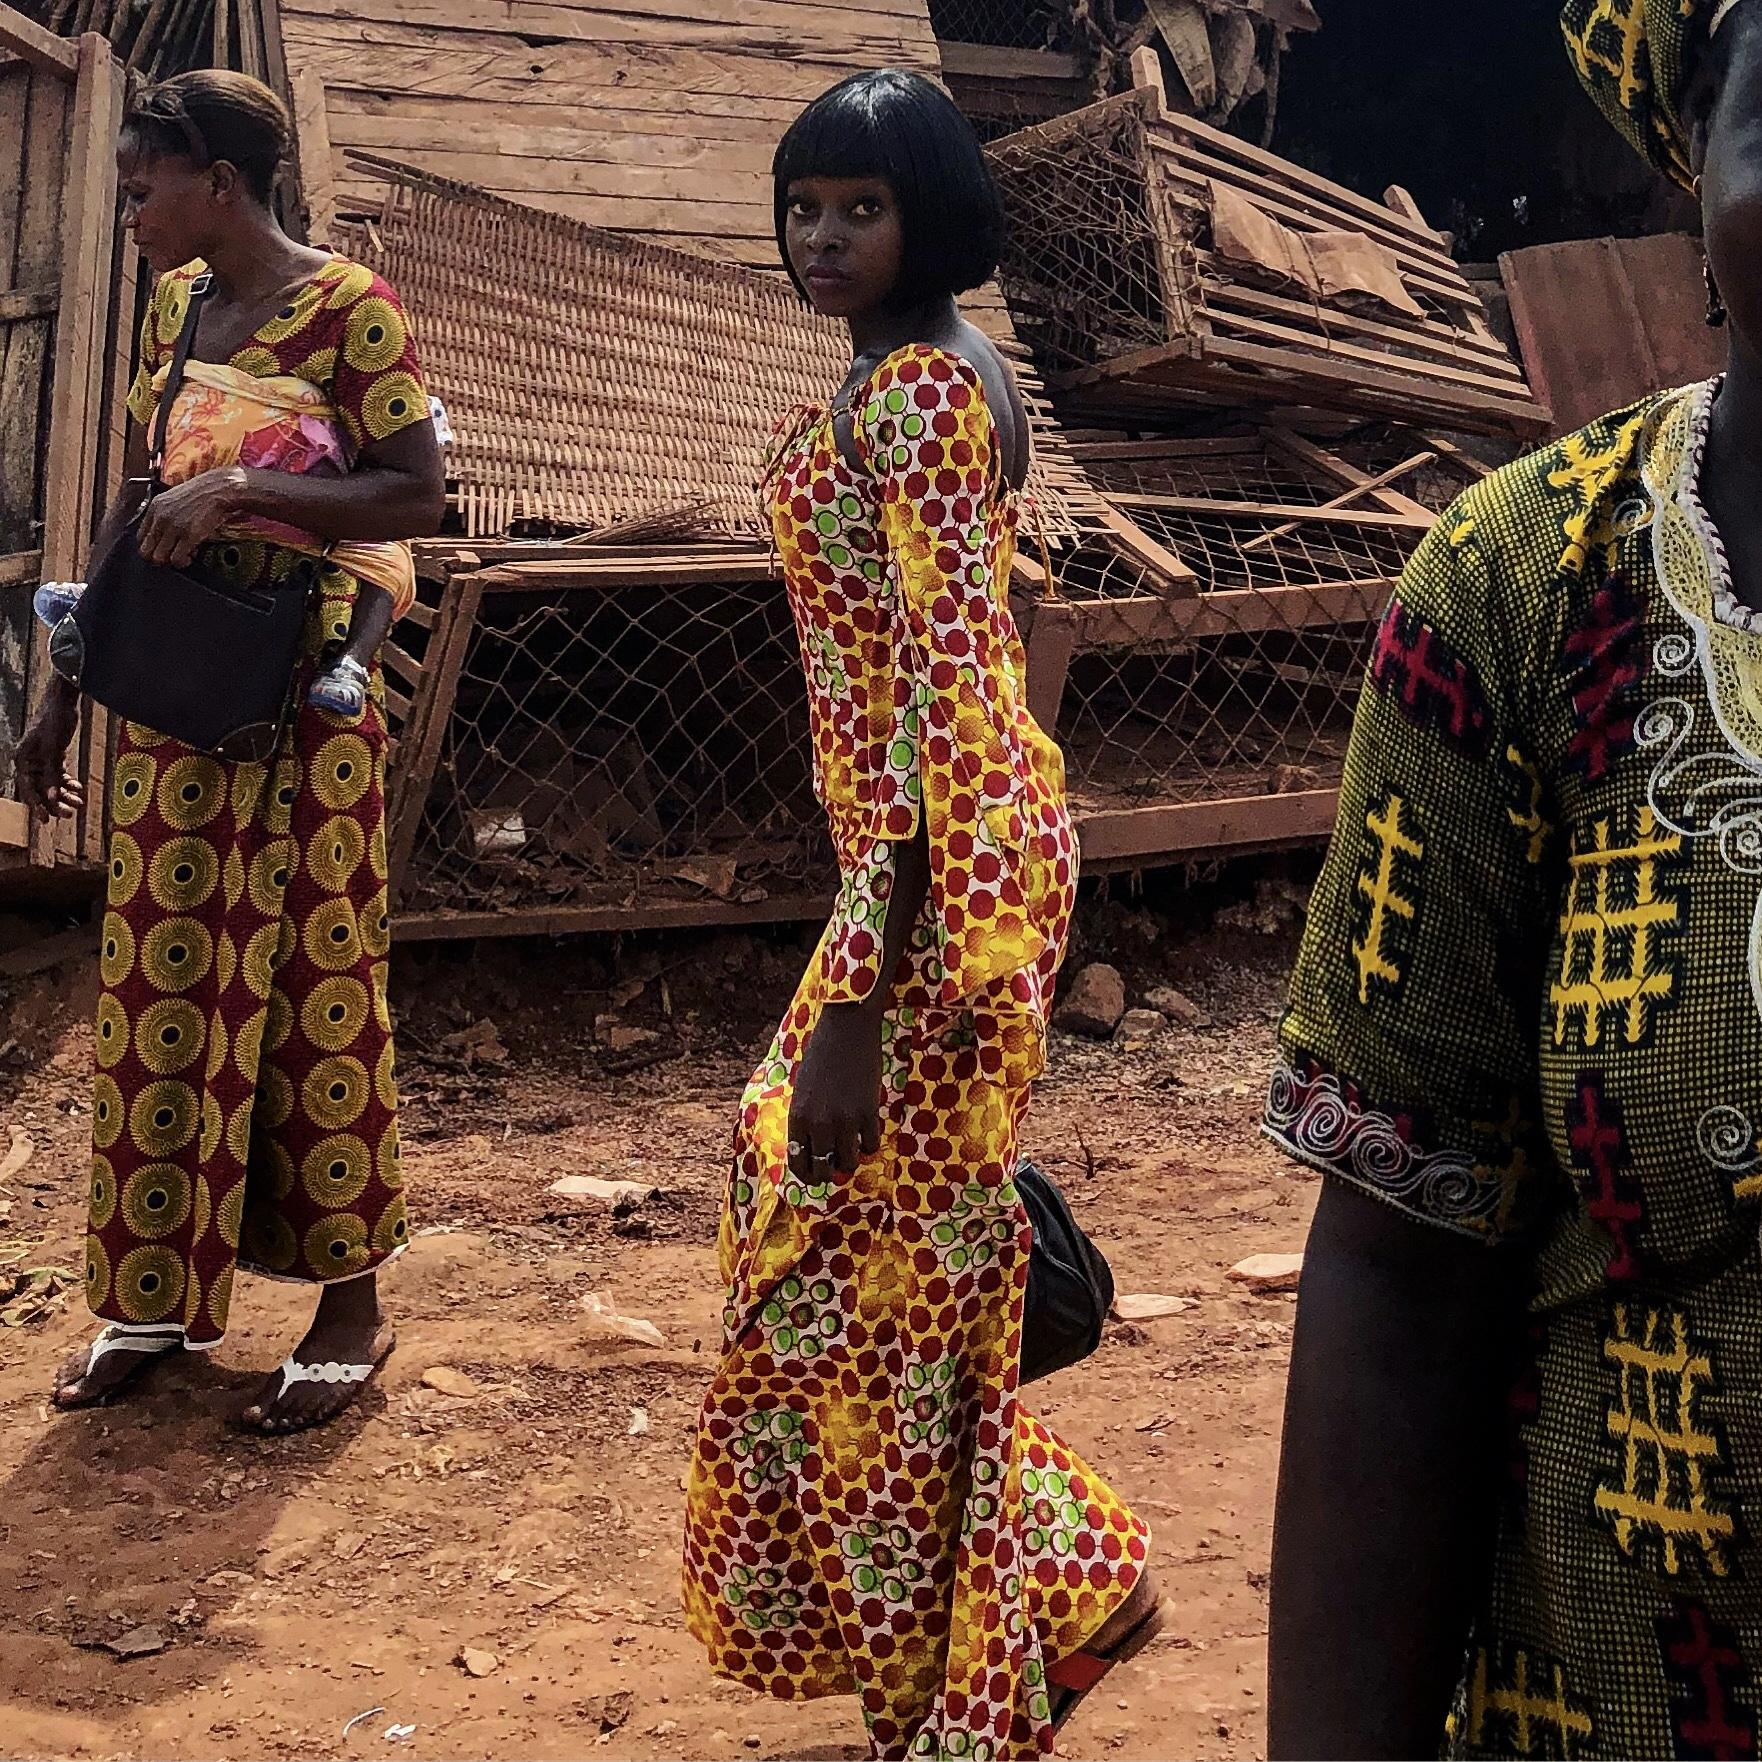 JOANA CHOUMALI Abidjan, Ivory Coast  joanachoumali.com   @joana_choumali